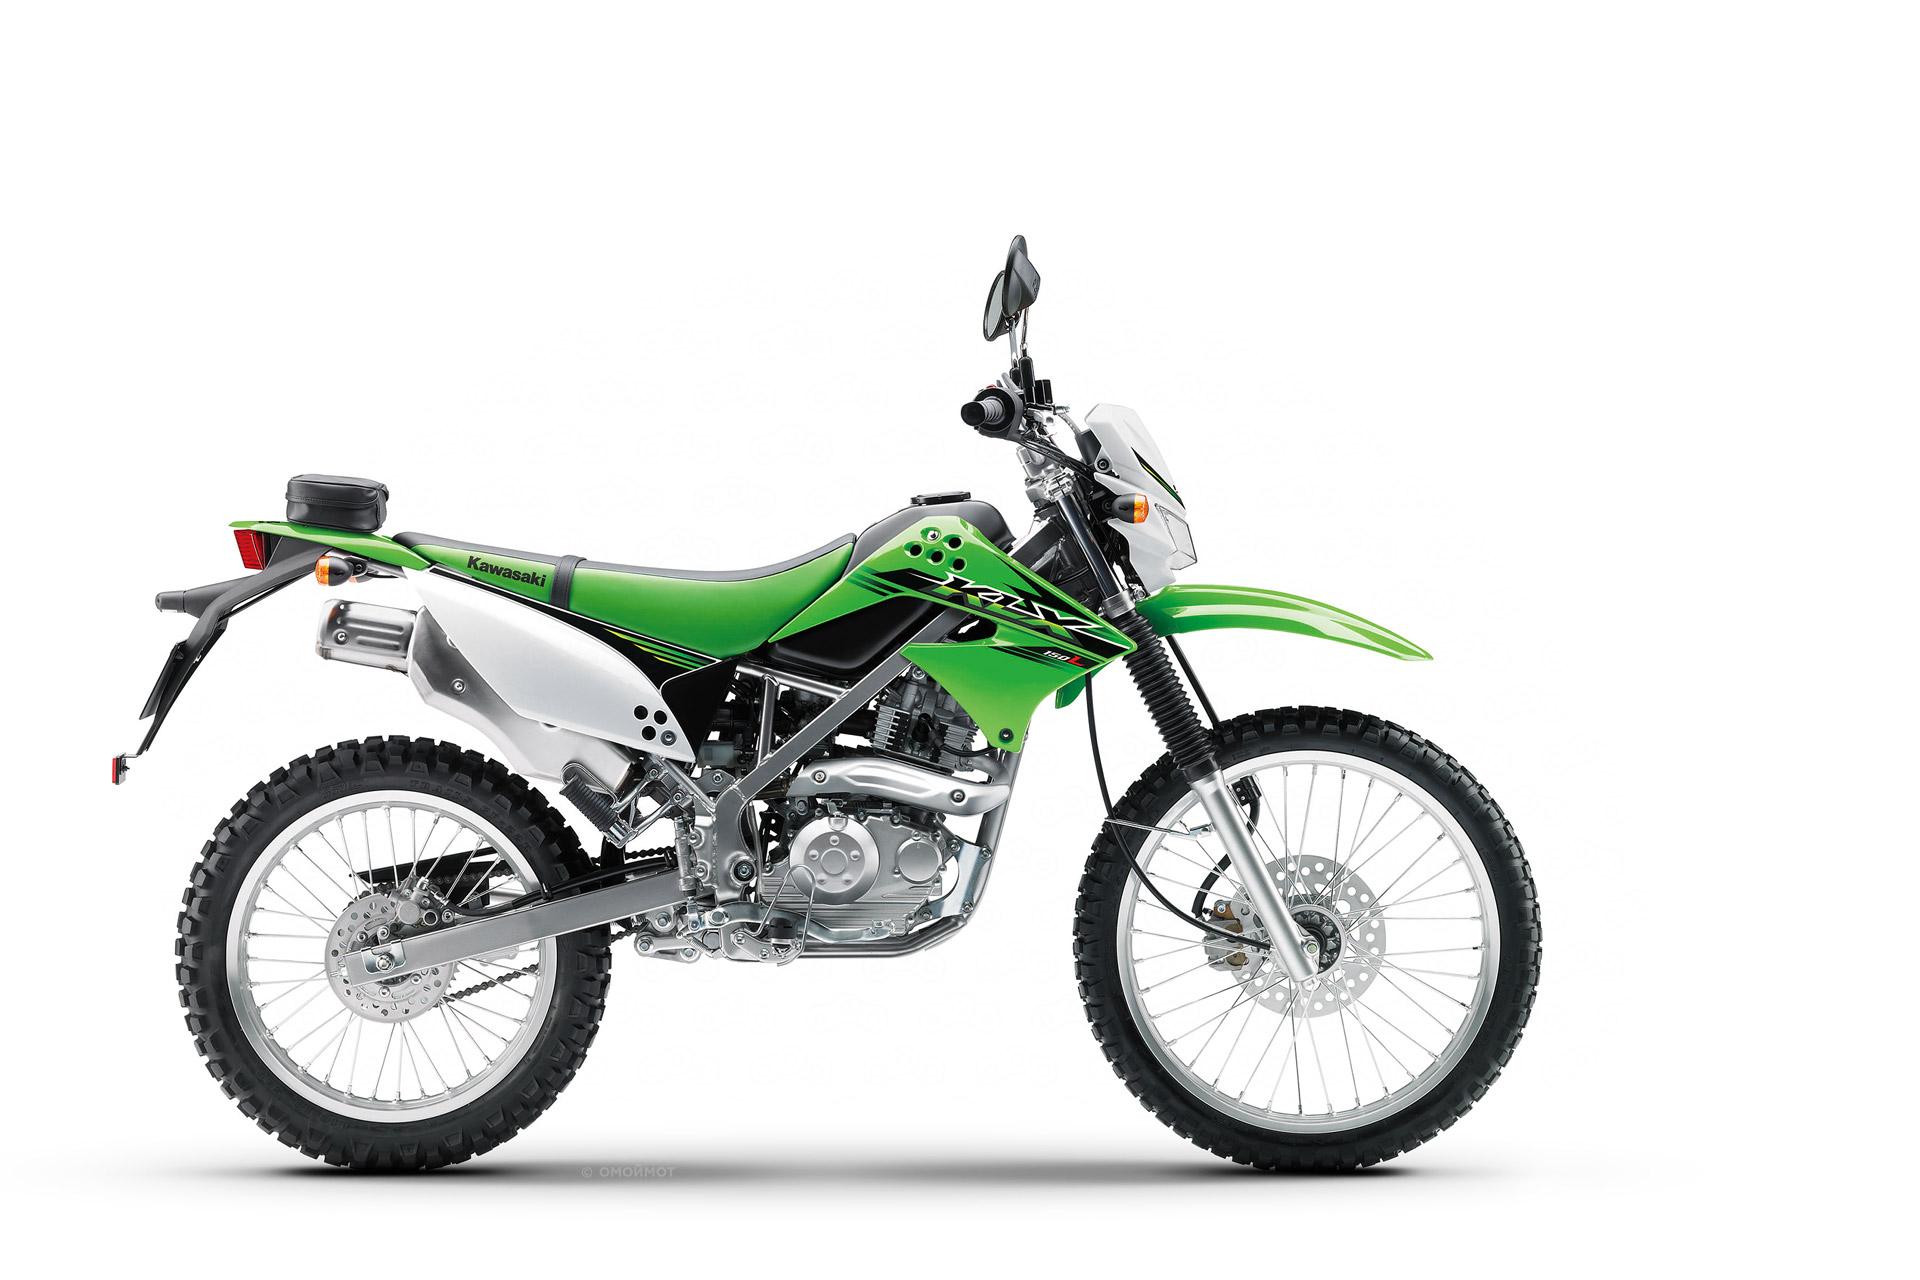 KLX150L